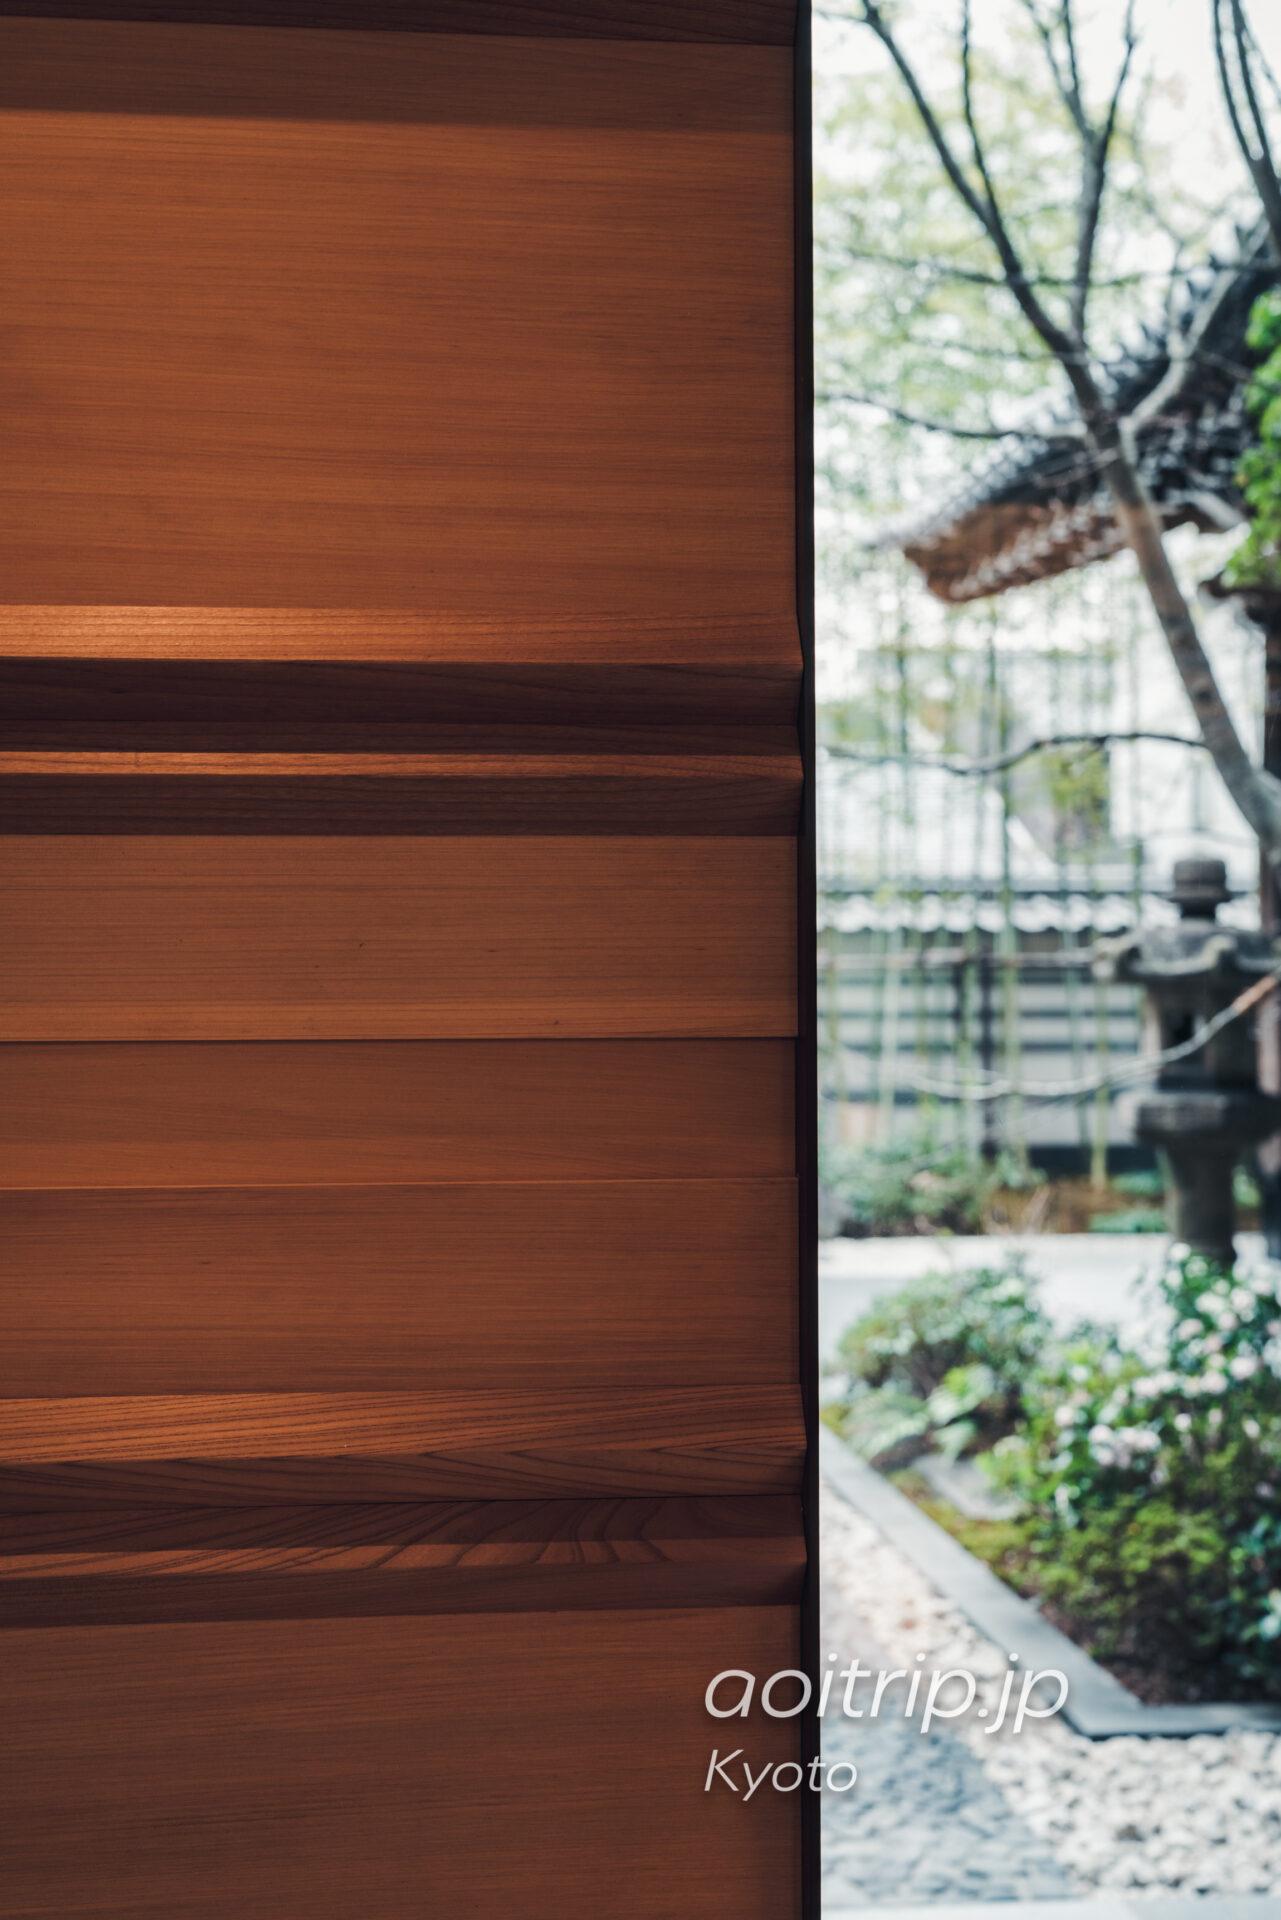 HOTEL THE MITSUI KYOTO 梶井宮門 改修時に再利用された木材